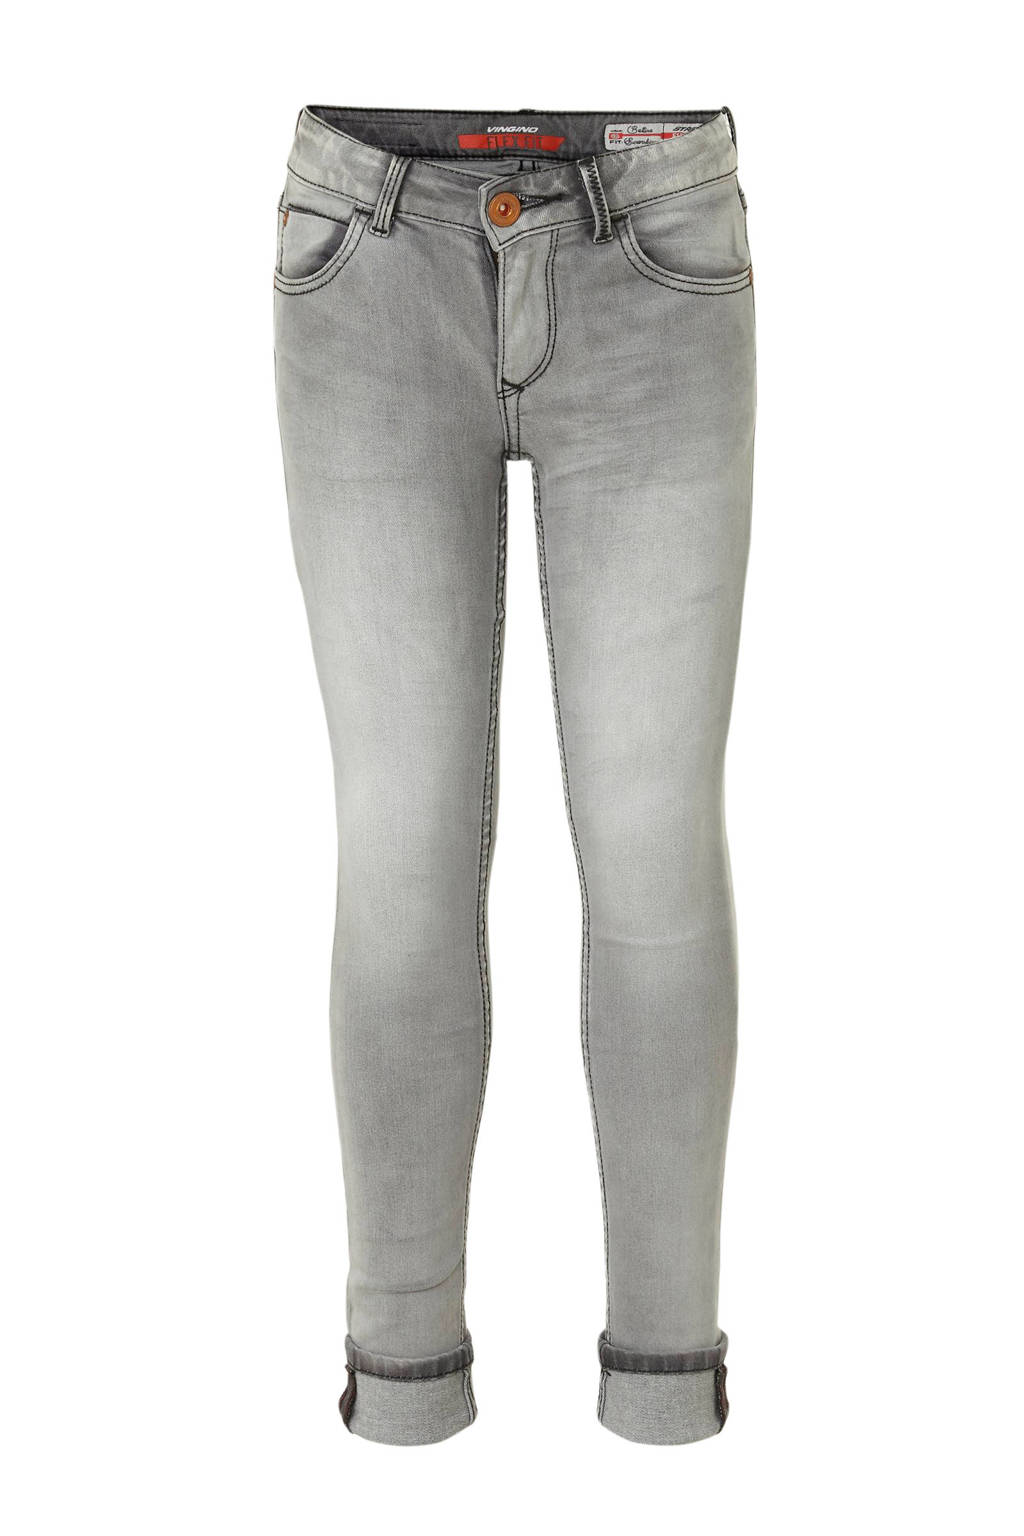 Vingino skinny jeans Bettine, Dark grey vintage